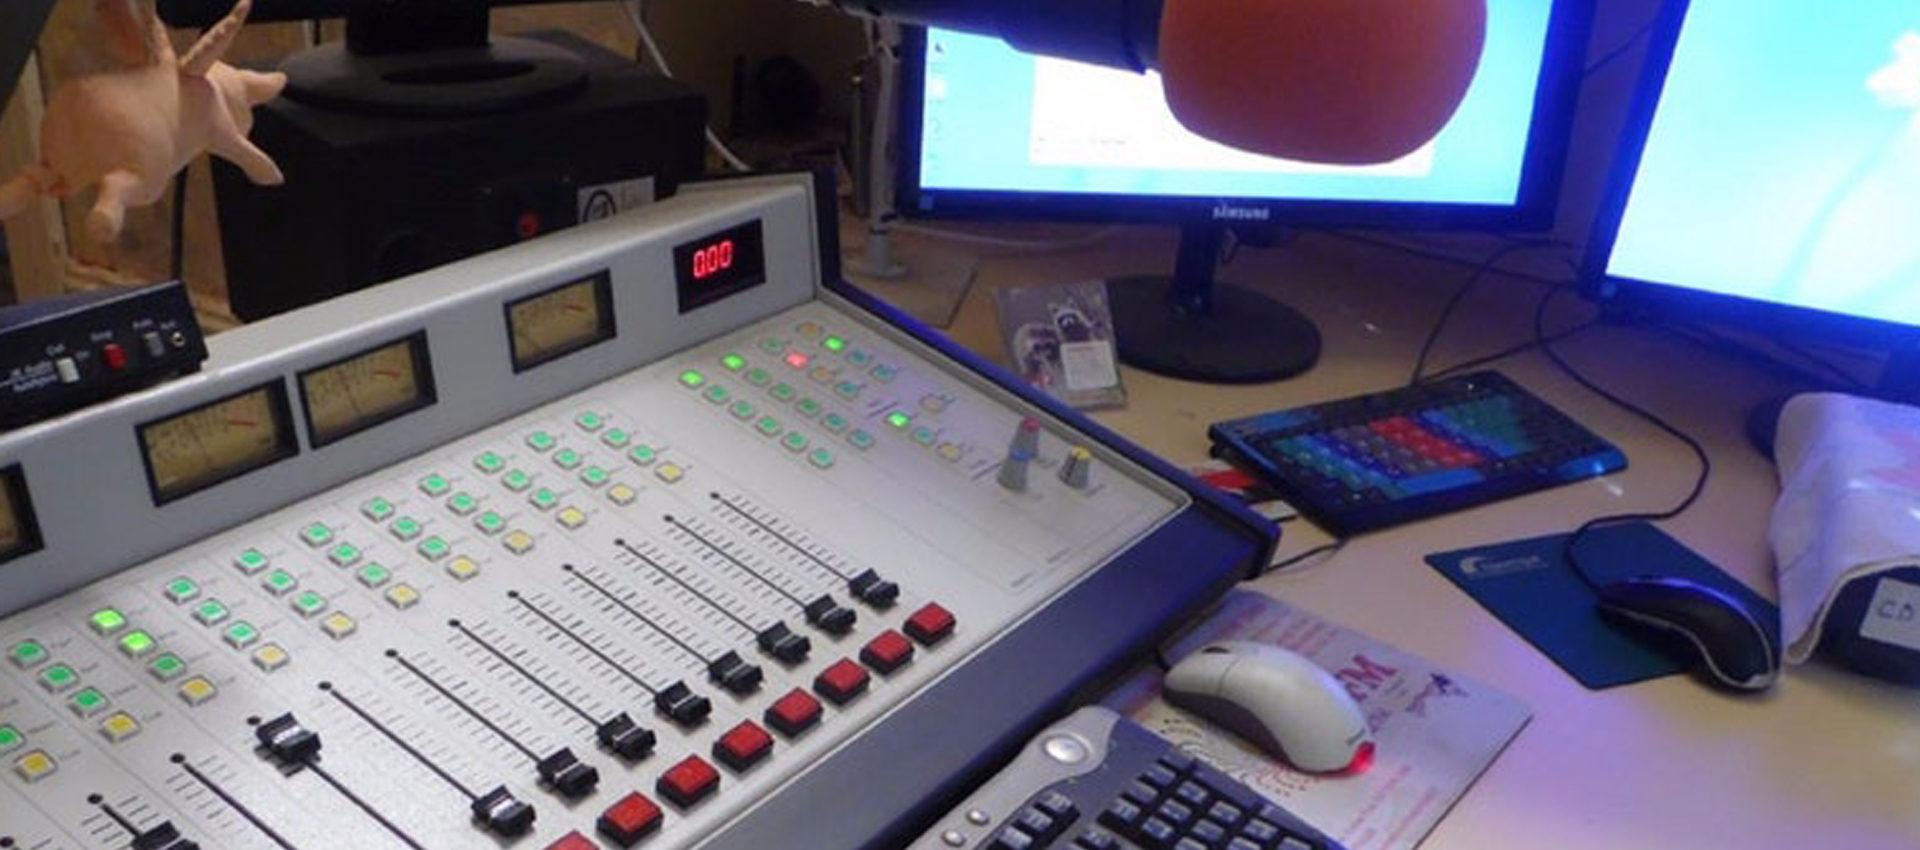 local artist radio station